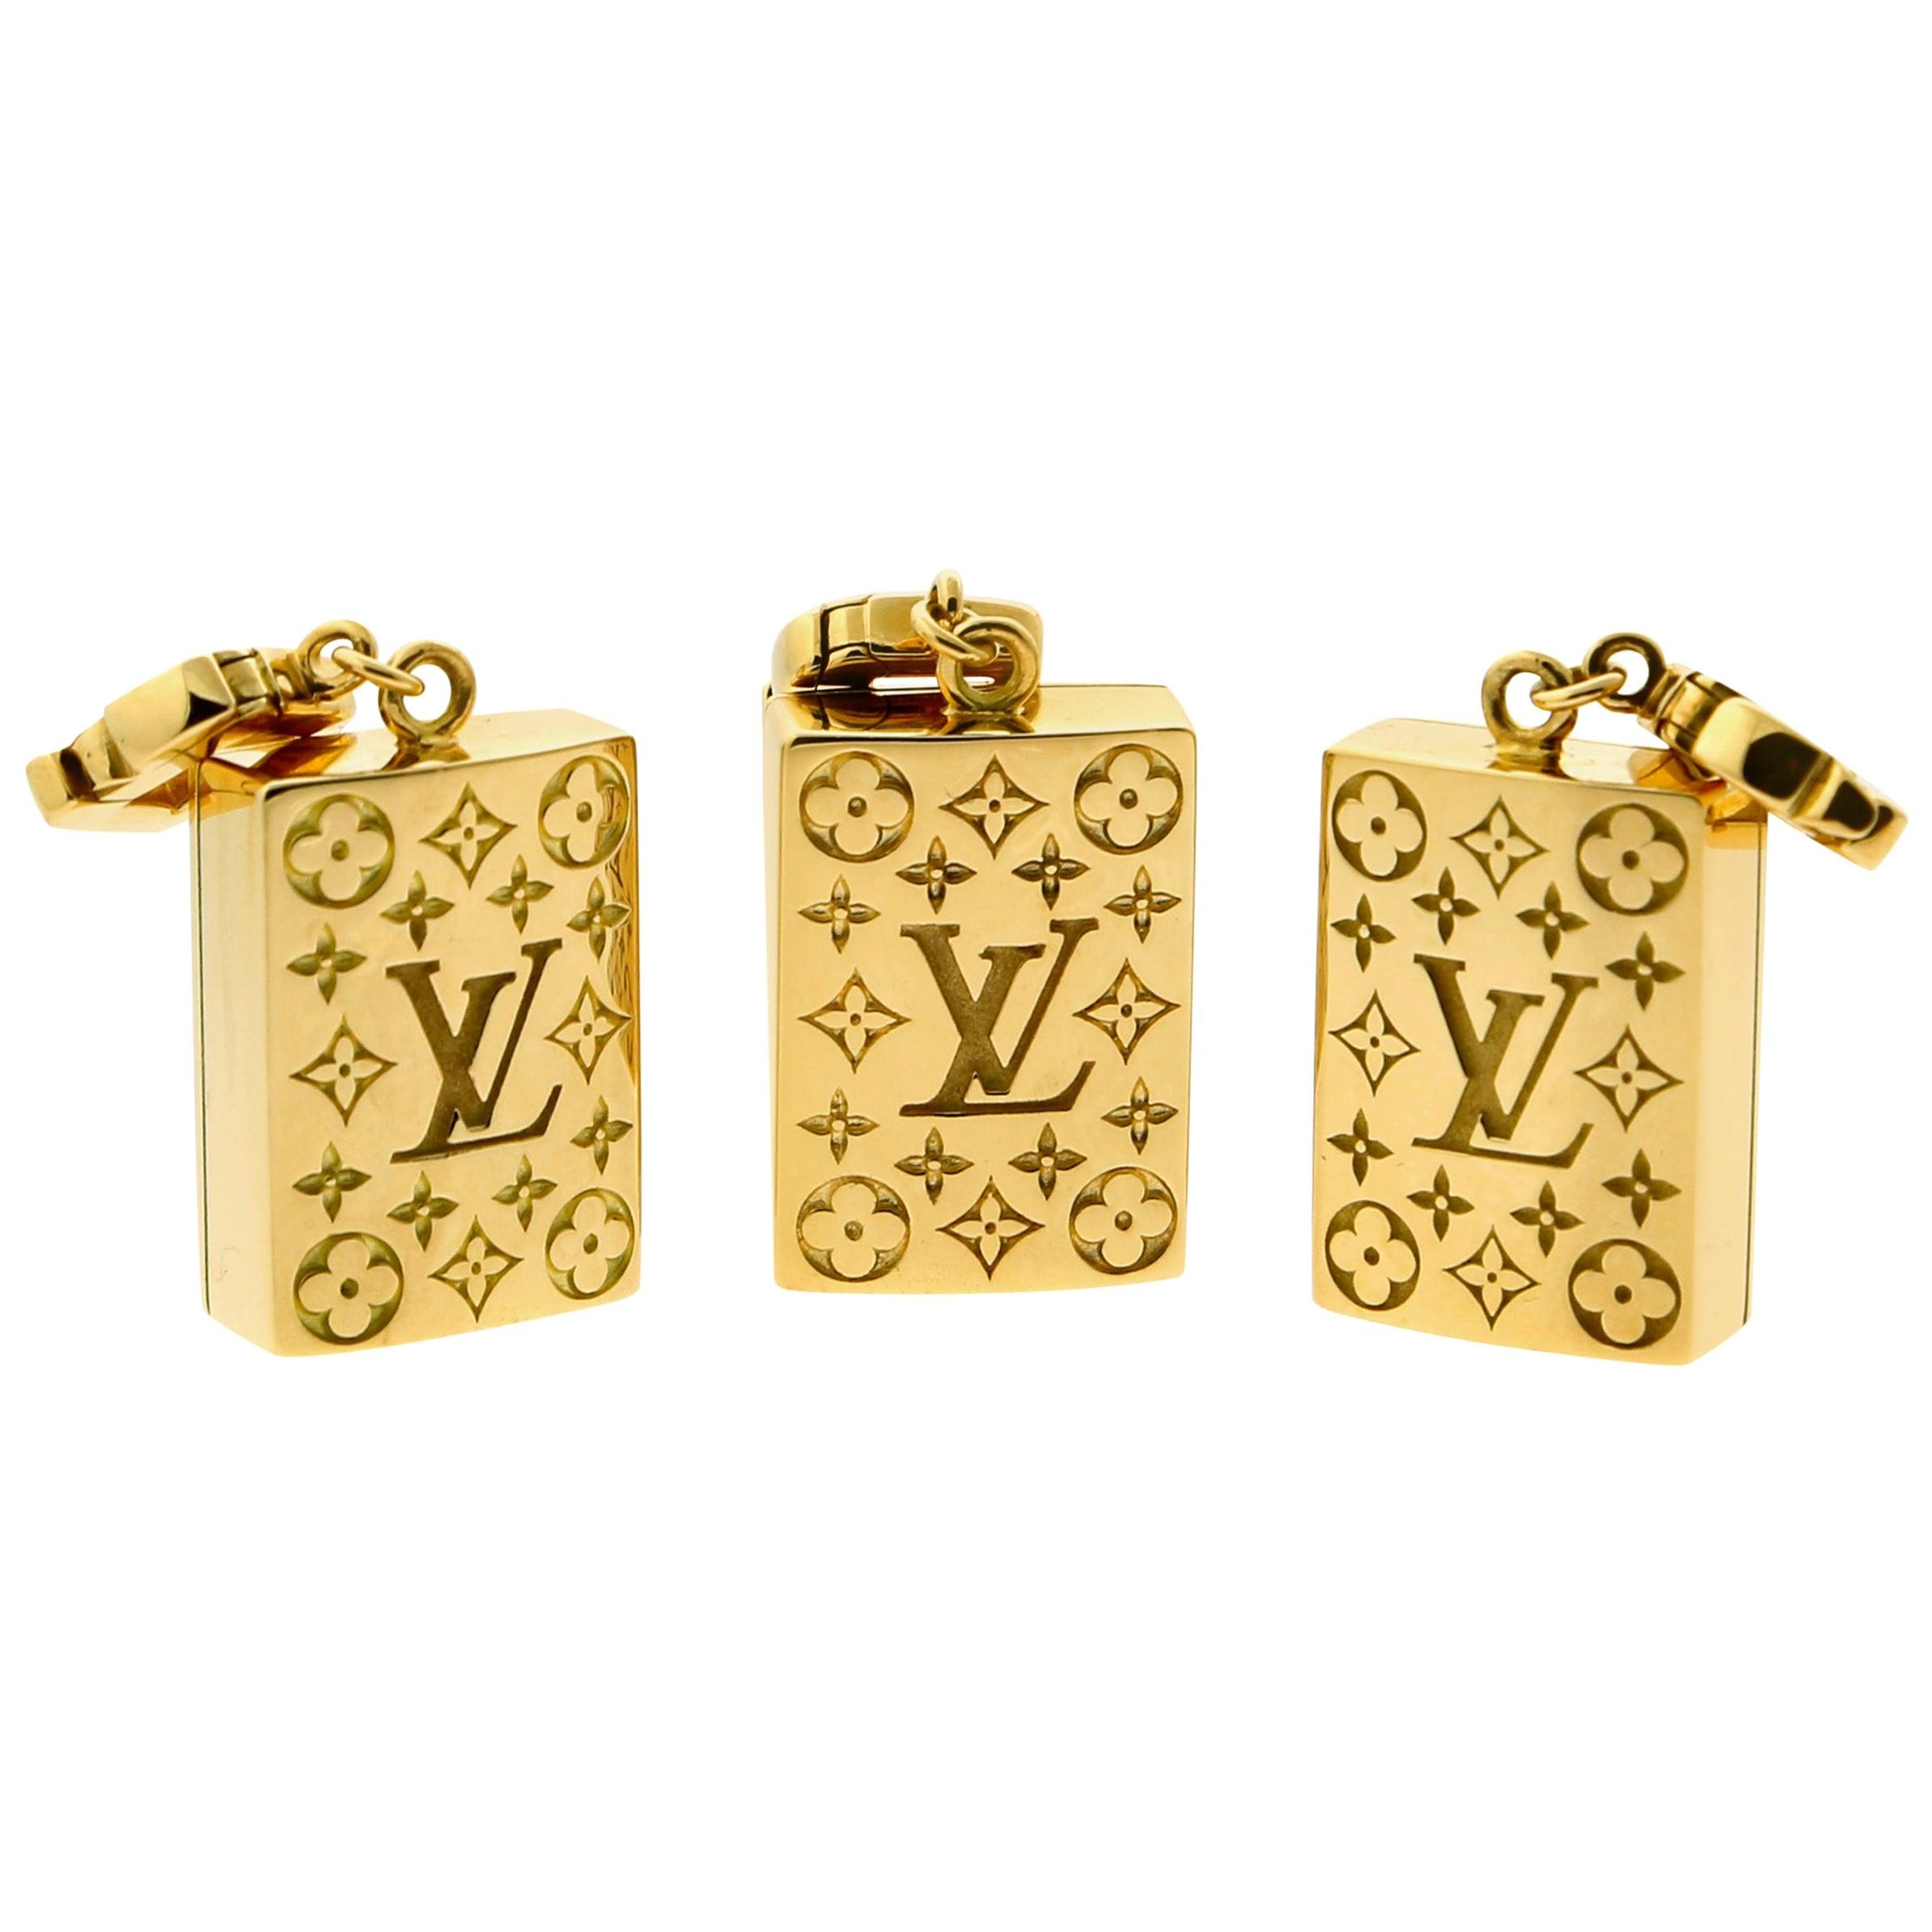 Louis Vuitton Limited Edition Mahjong Tile Gold Set